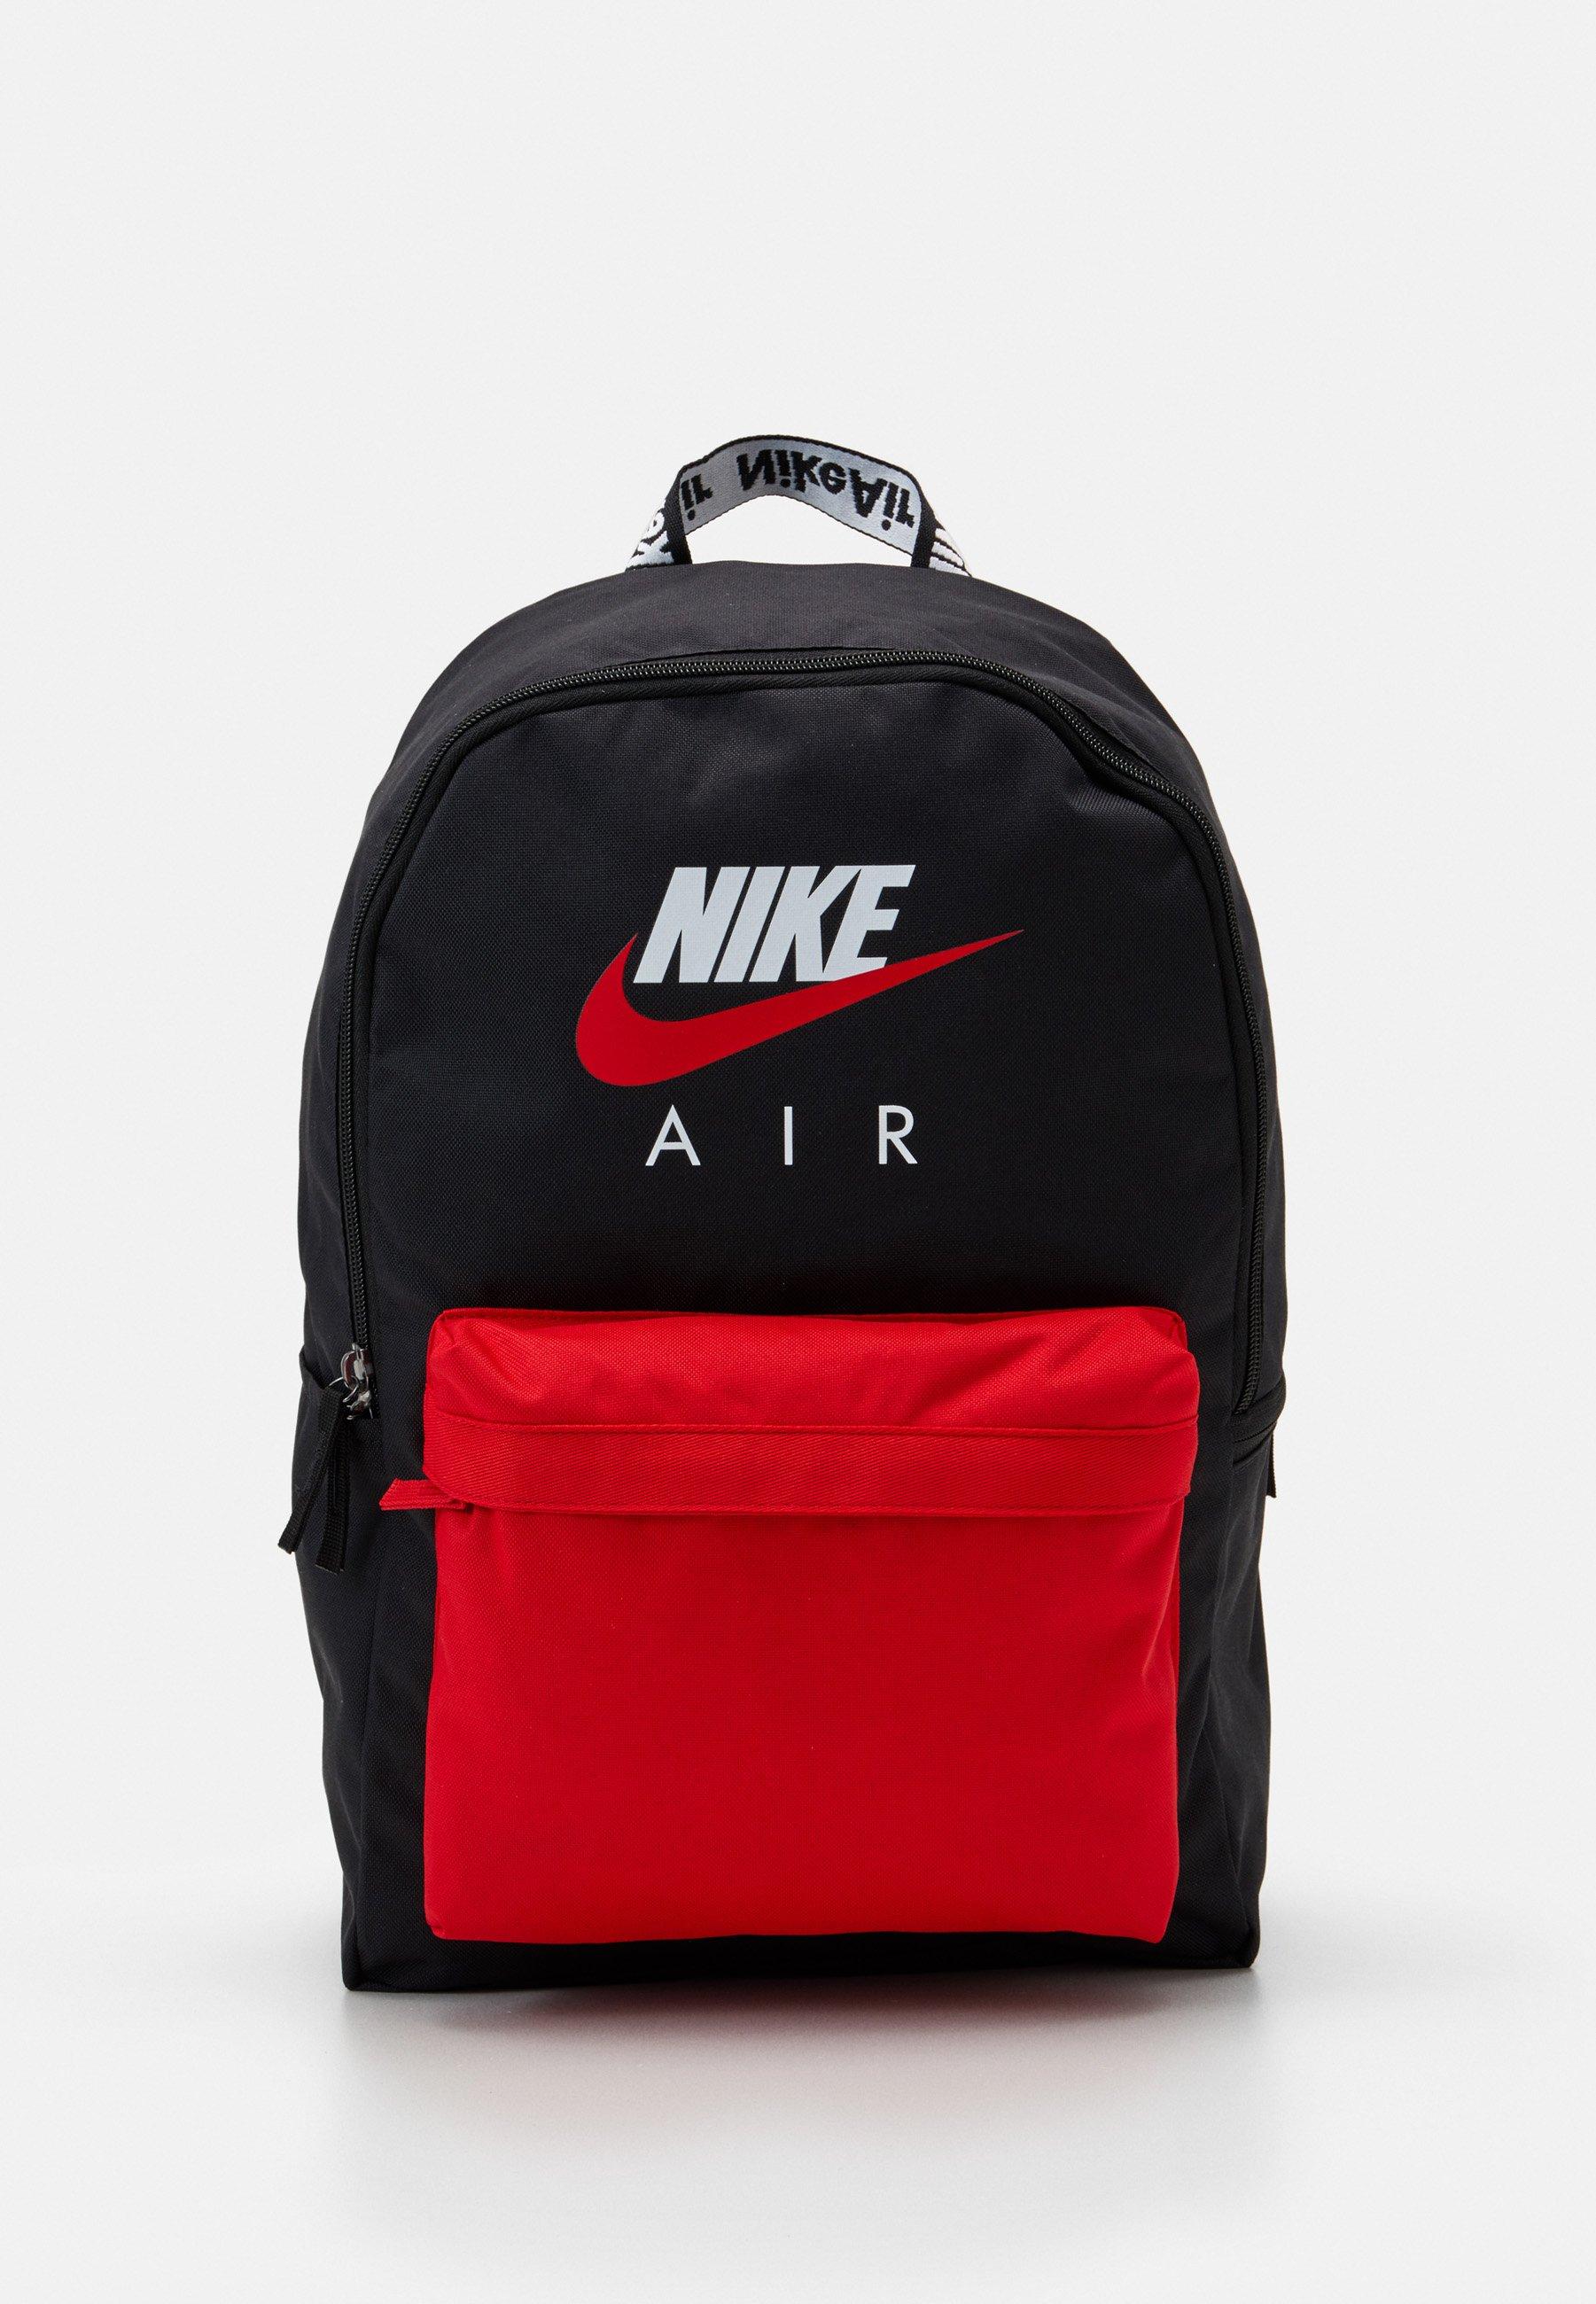 palma Suyo Dramaturgo  Nike Sportswear AIR HERITAGE UNISEX - Rucksack - black/university red/black  - Zalando.co.uk